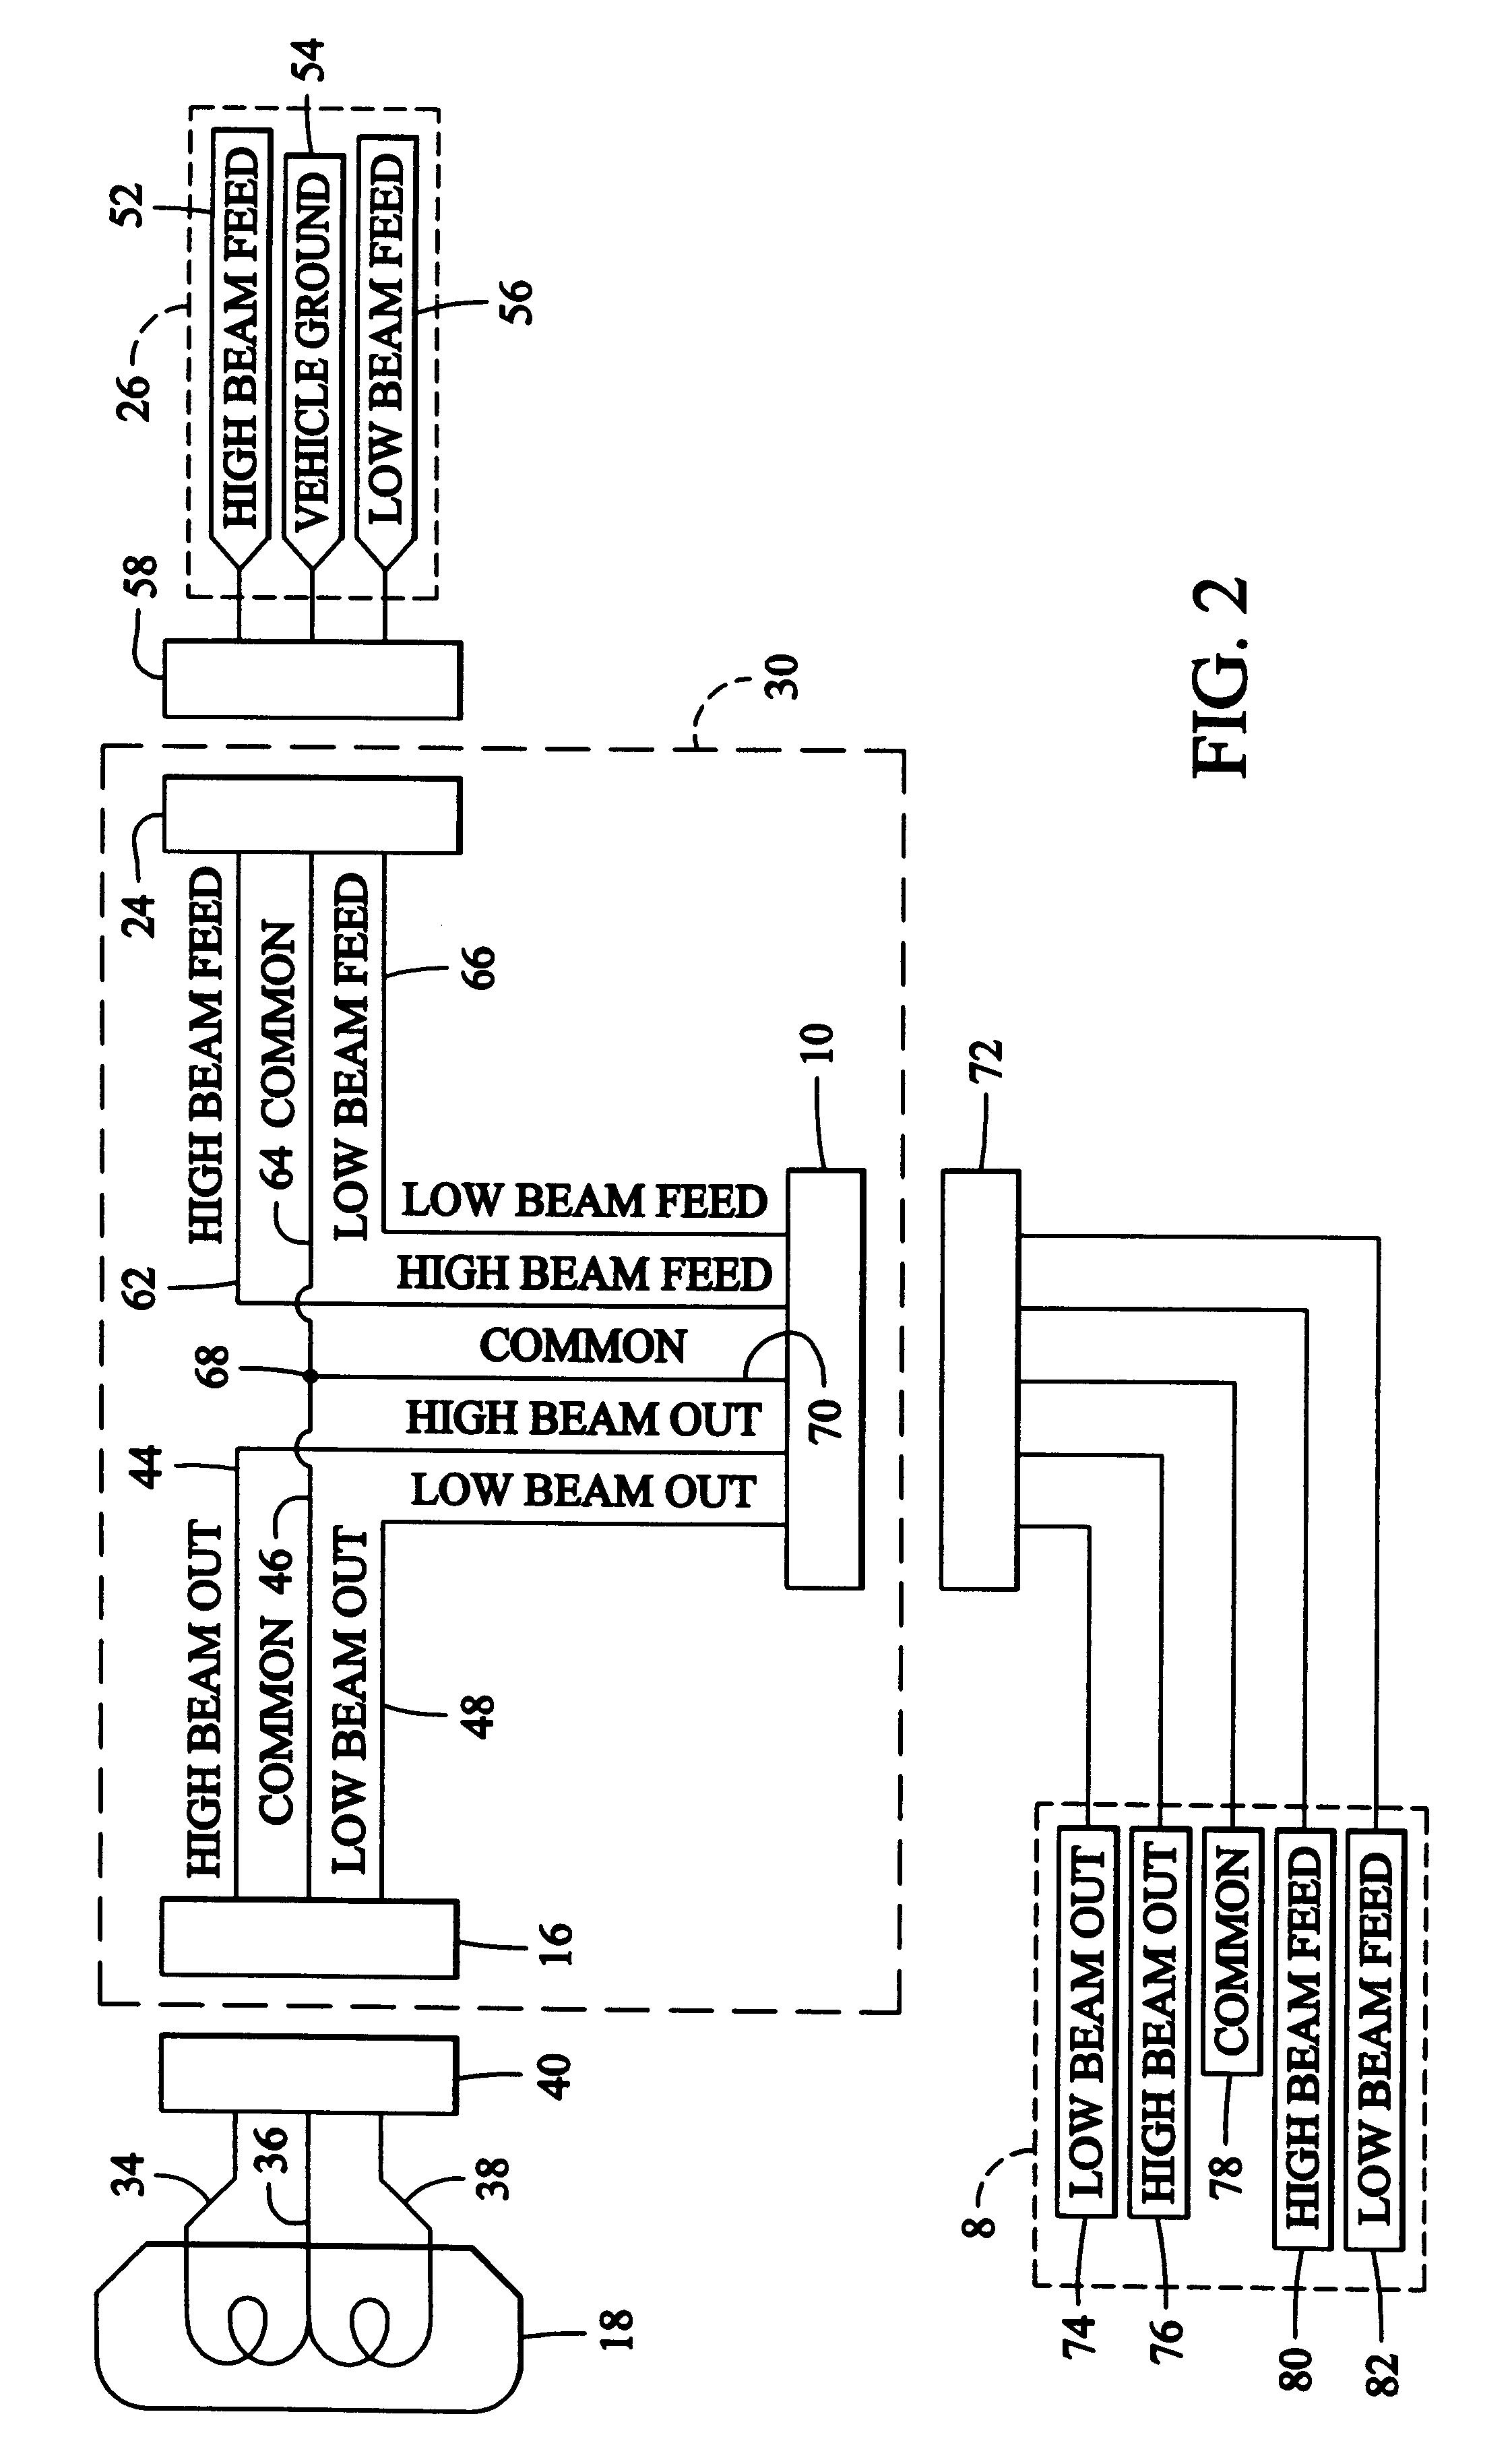 curtis plow wiring diagram - mercury grand marquis 4 6l engine diagram for wiring  diagram schematics  wiring diagram schematics